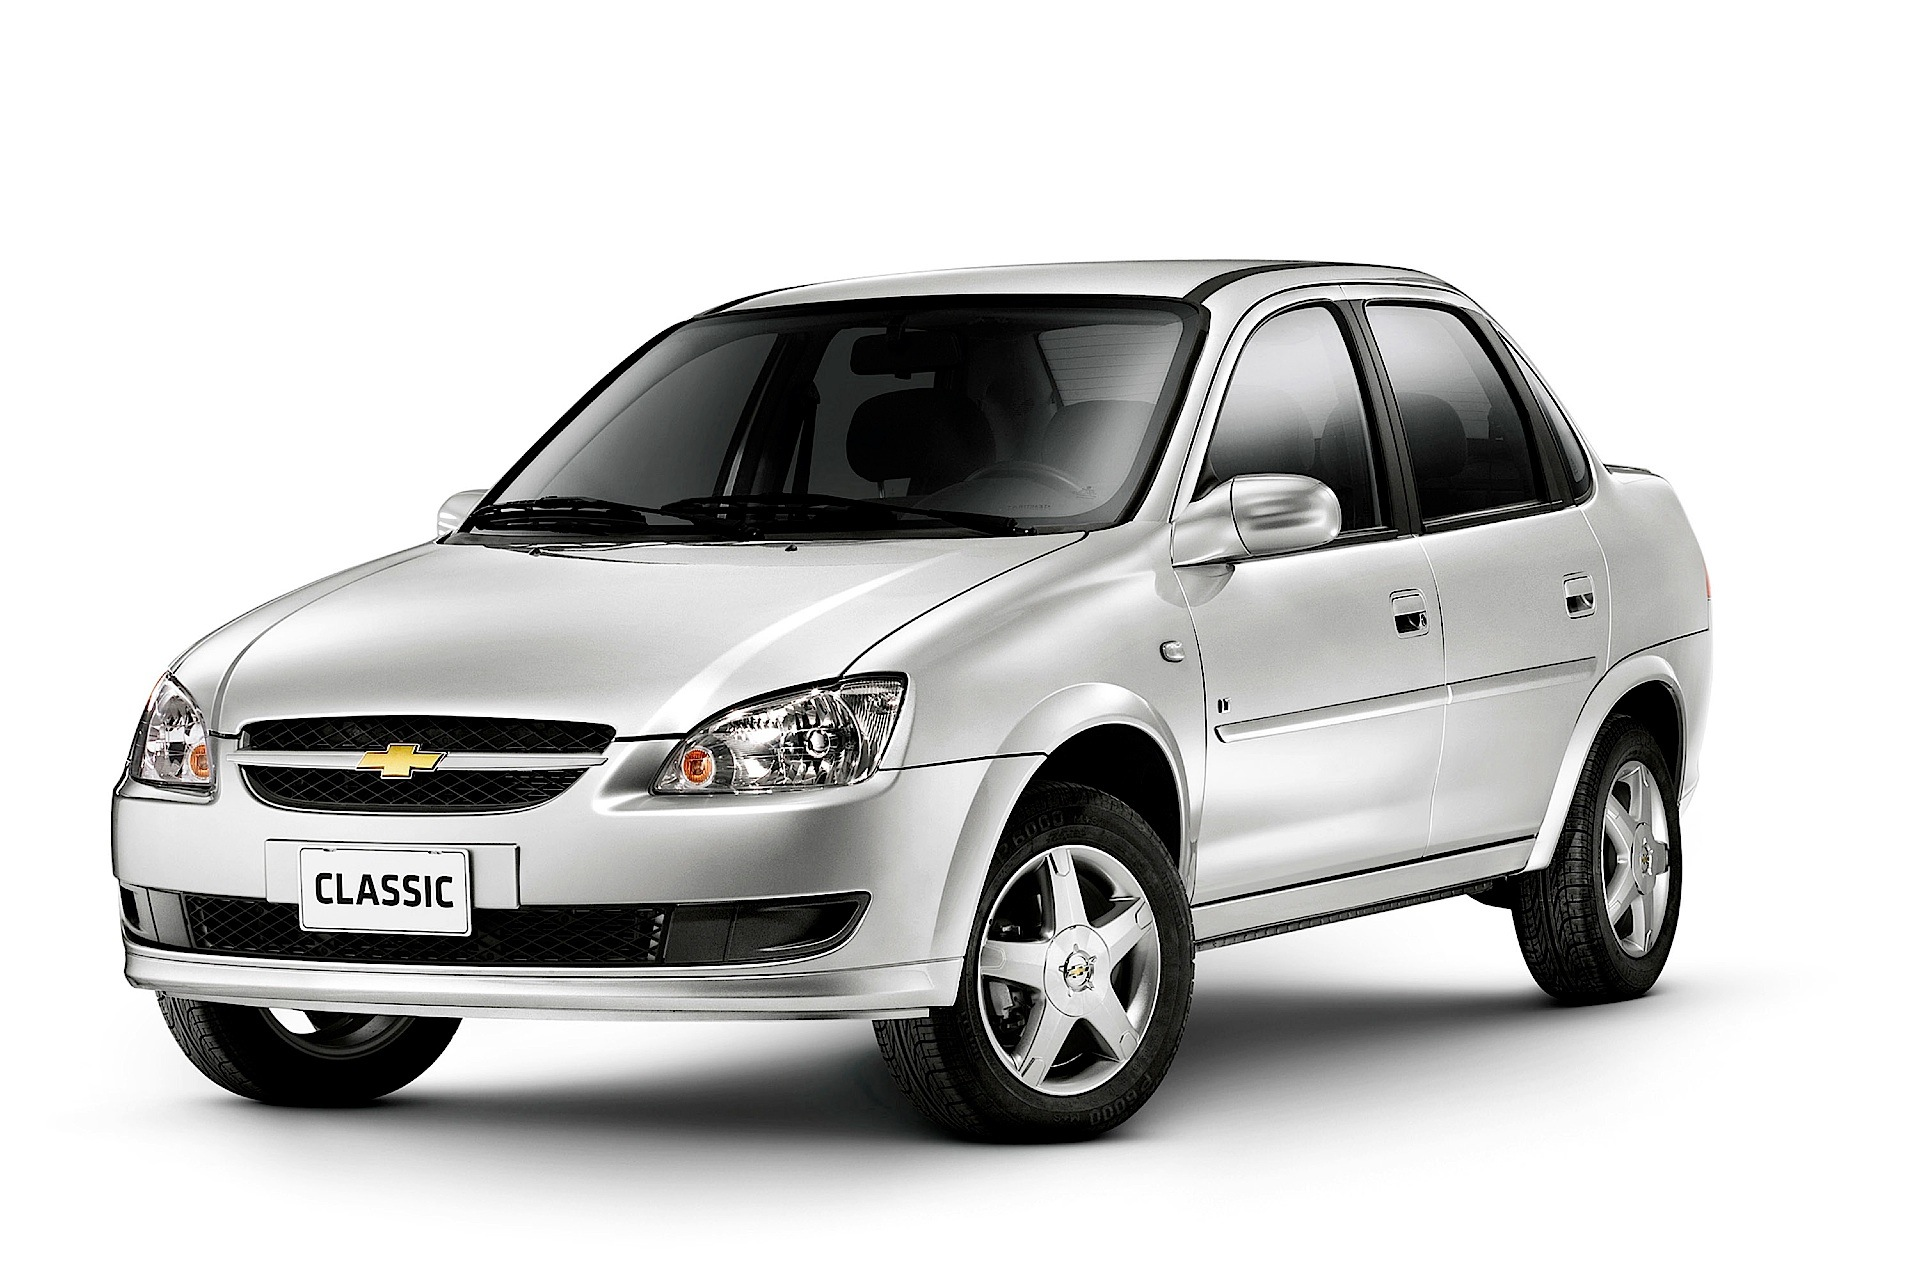 CHEVROLET Classic - 2002, 2003, 2004 - autoevolution